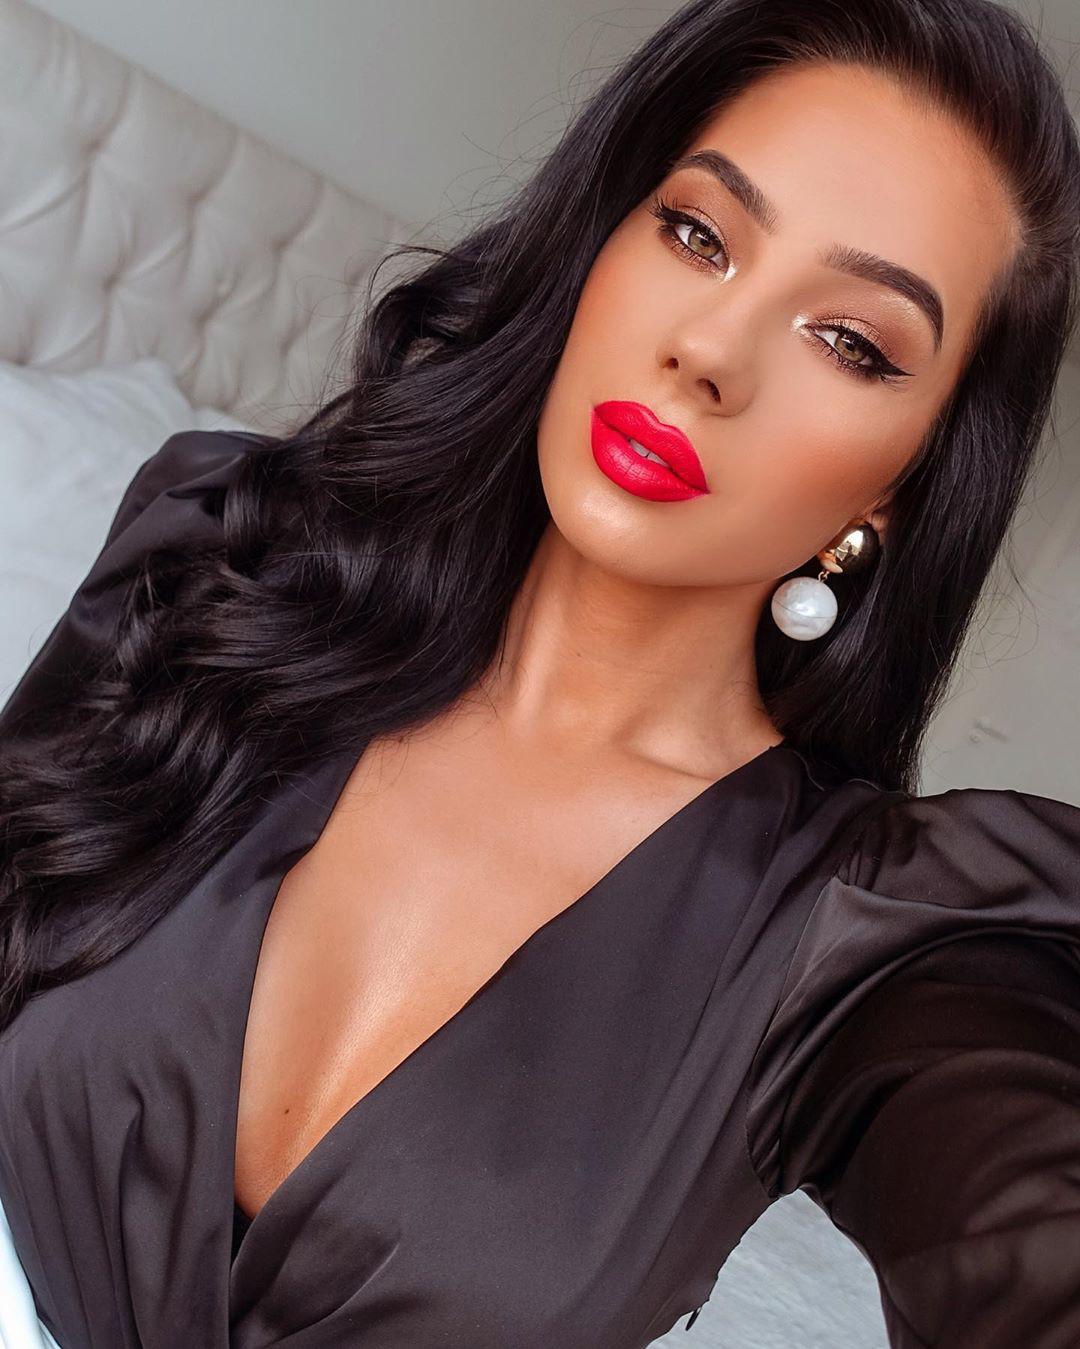 Klaudia Badura Cute Black Hairstyles, Bautiful Face, Lips Smile